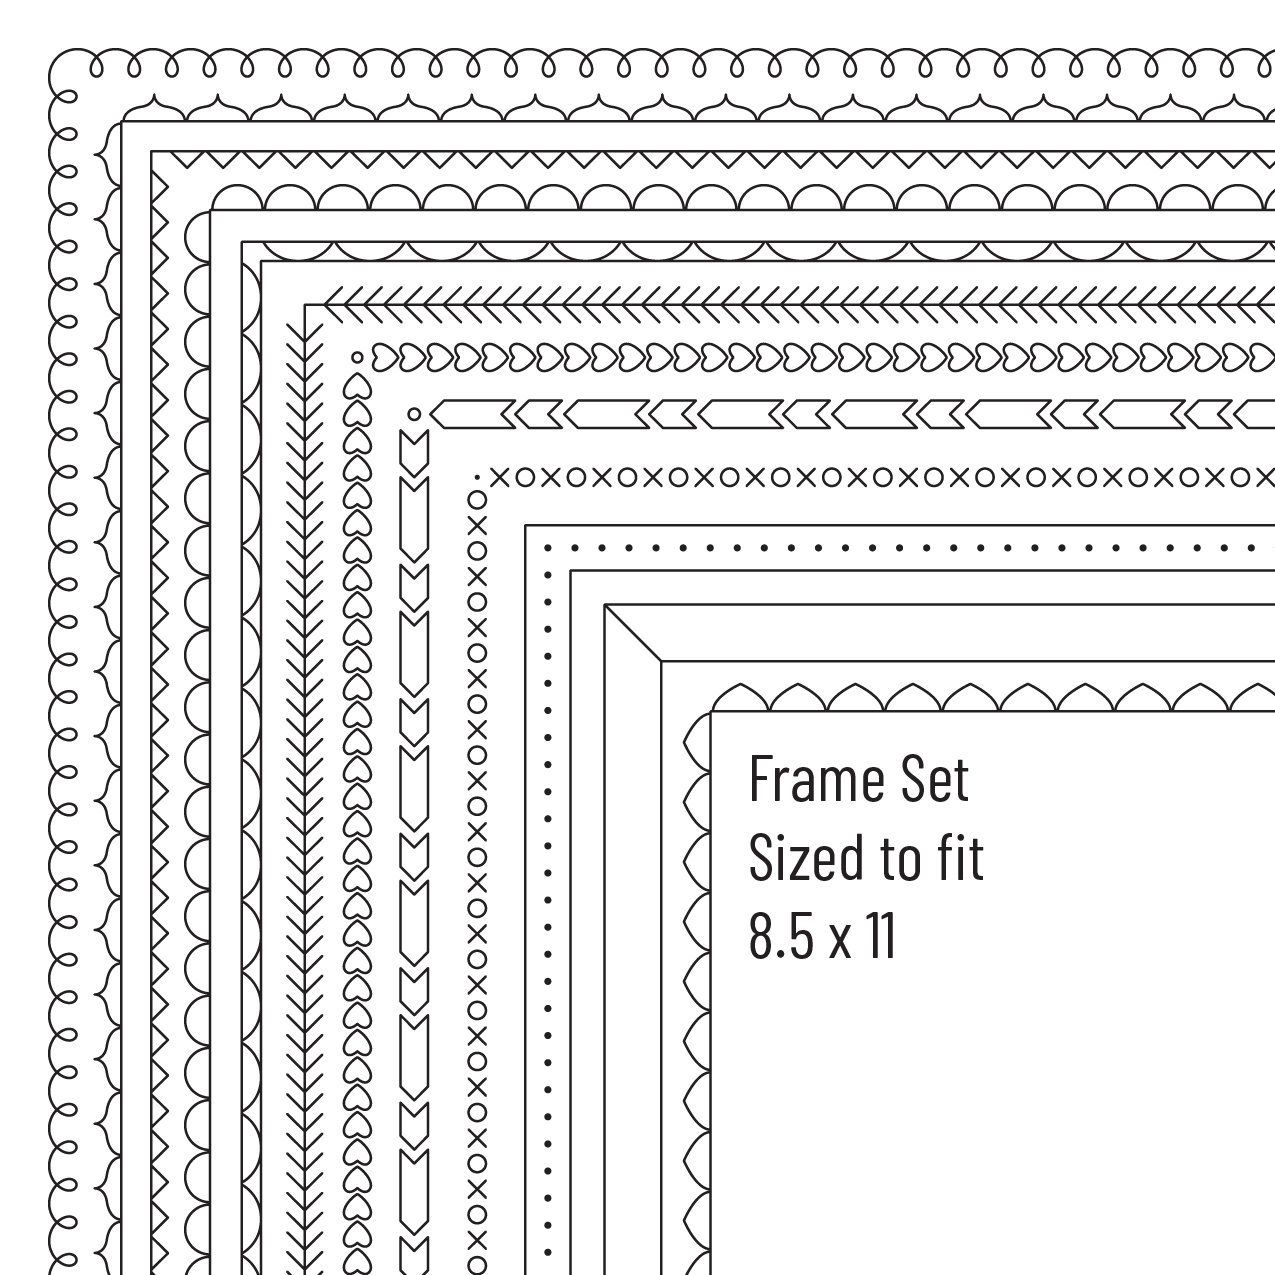 Digital Frames Clipart, Digital borders, 8.5 x 11,